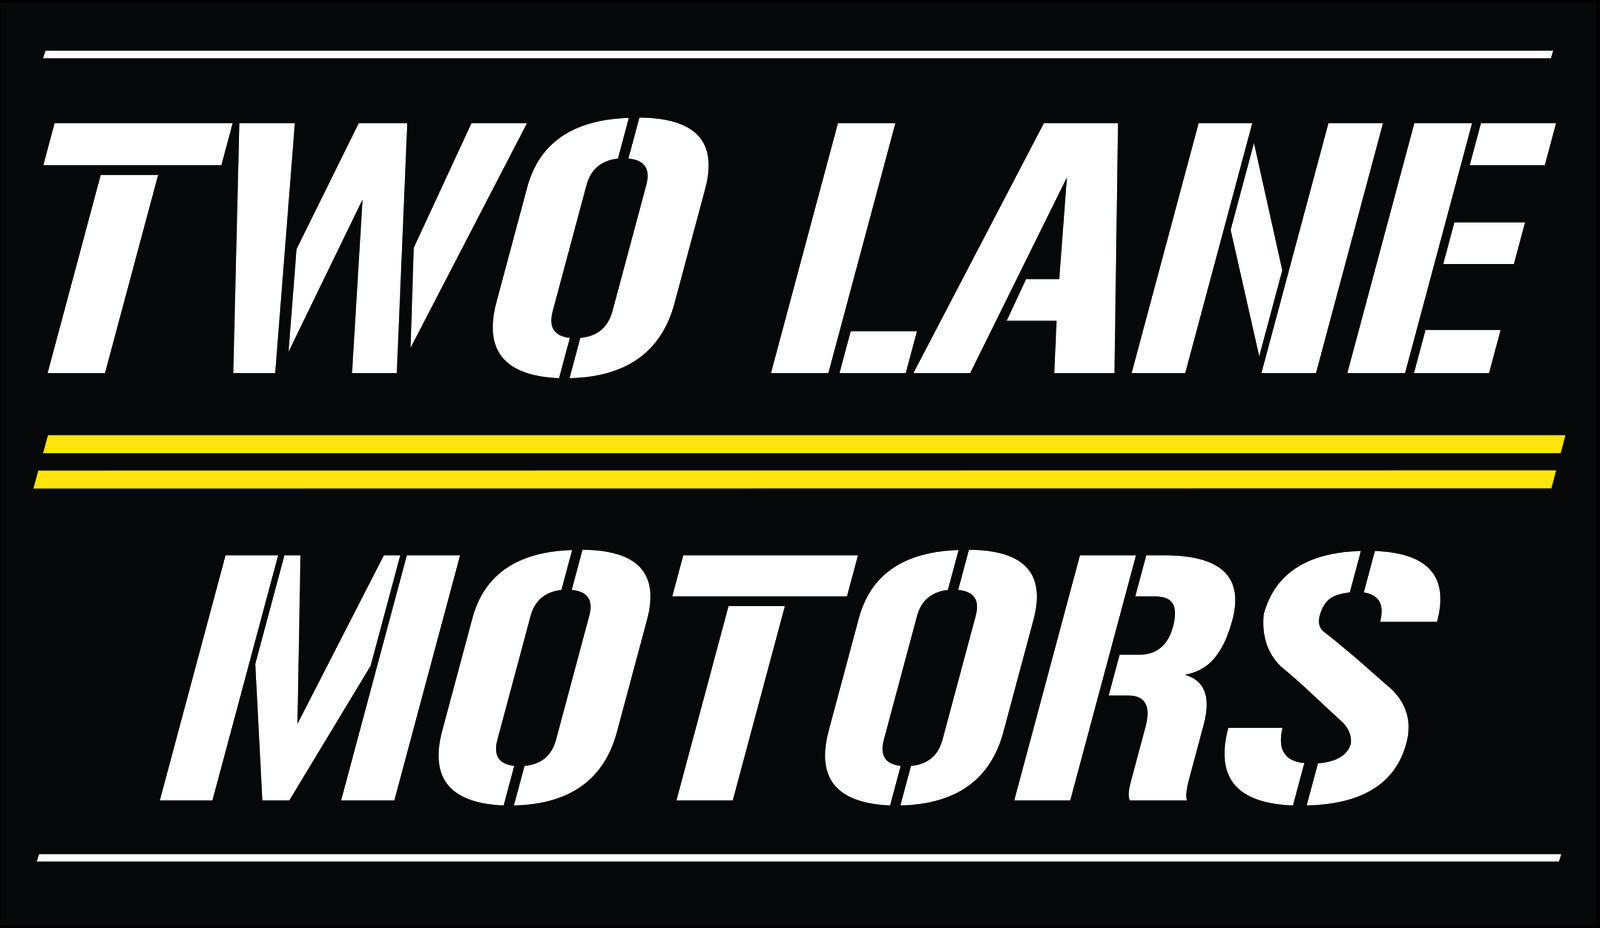 Trade Lane Motors Used Cars Houston Tx Dealer >> Lane Motors - impremedia.net